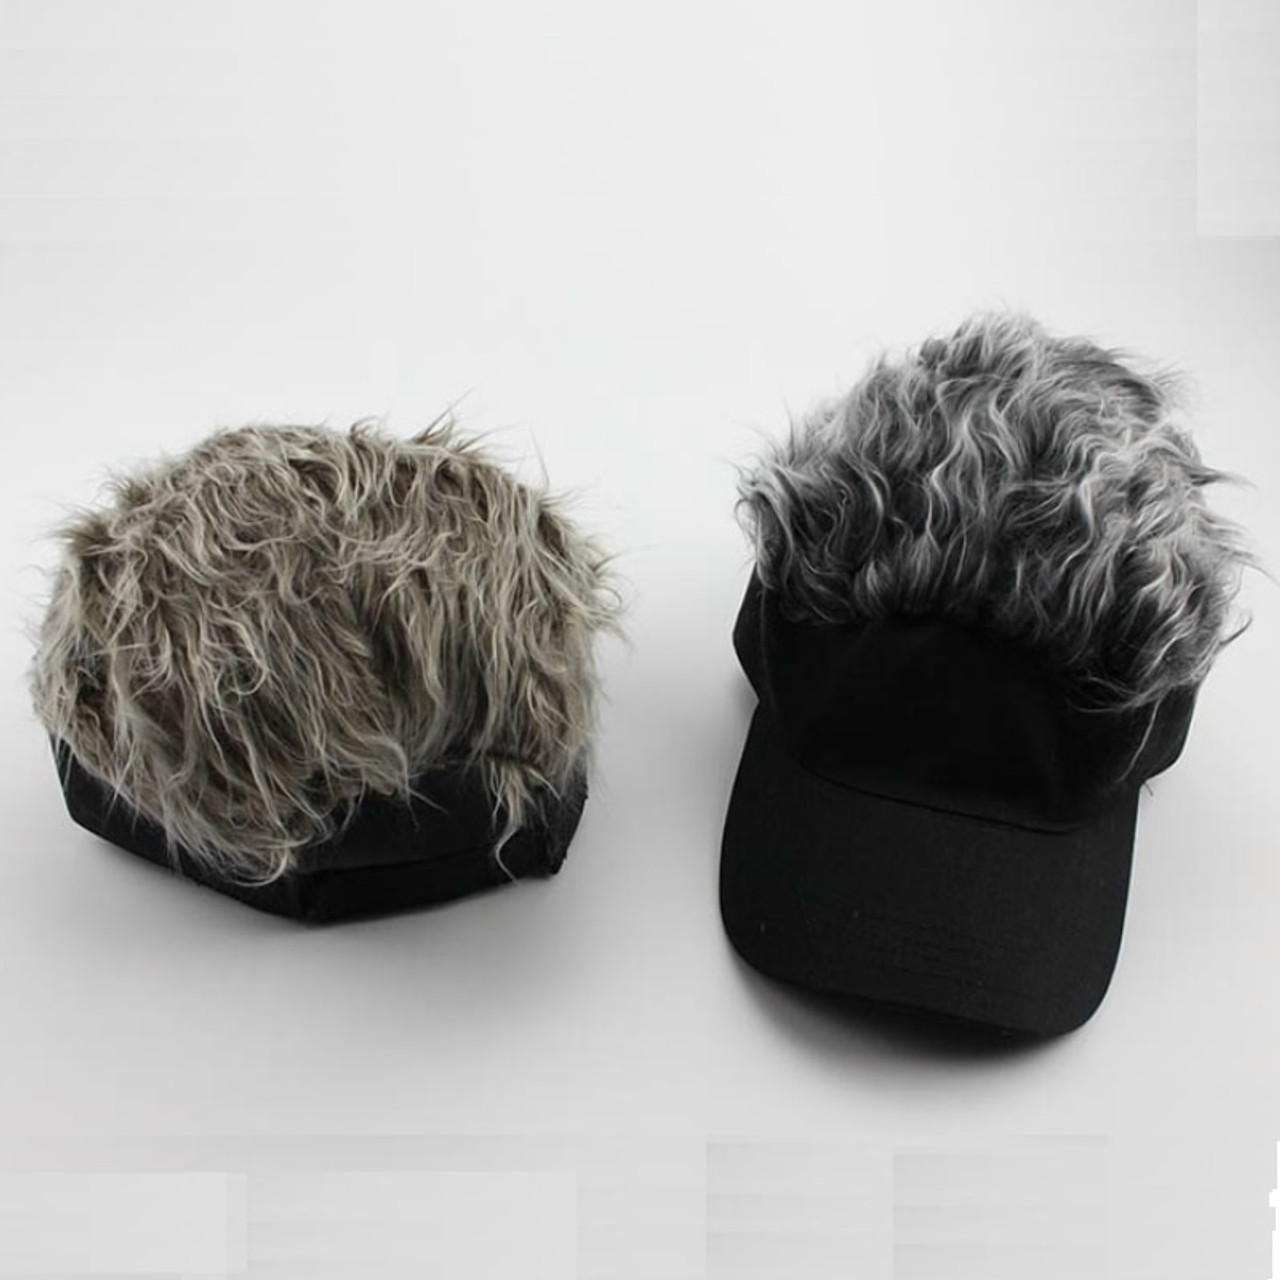 ... Funny Men Adjustable Wig Cap Unisex Flair Hair Visor Snapback Casquette  Hat Casual Golf Caps Outdoor ... d1f5fc83f7d0